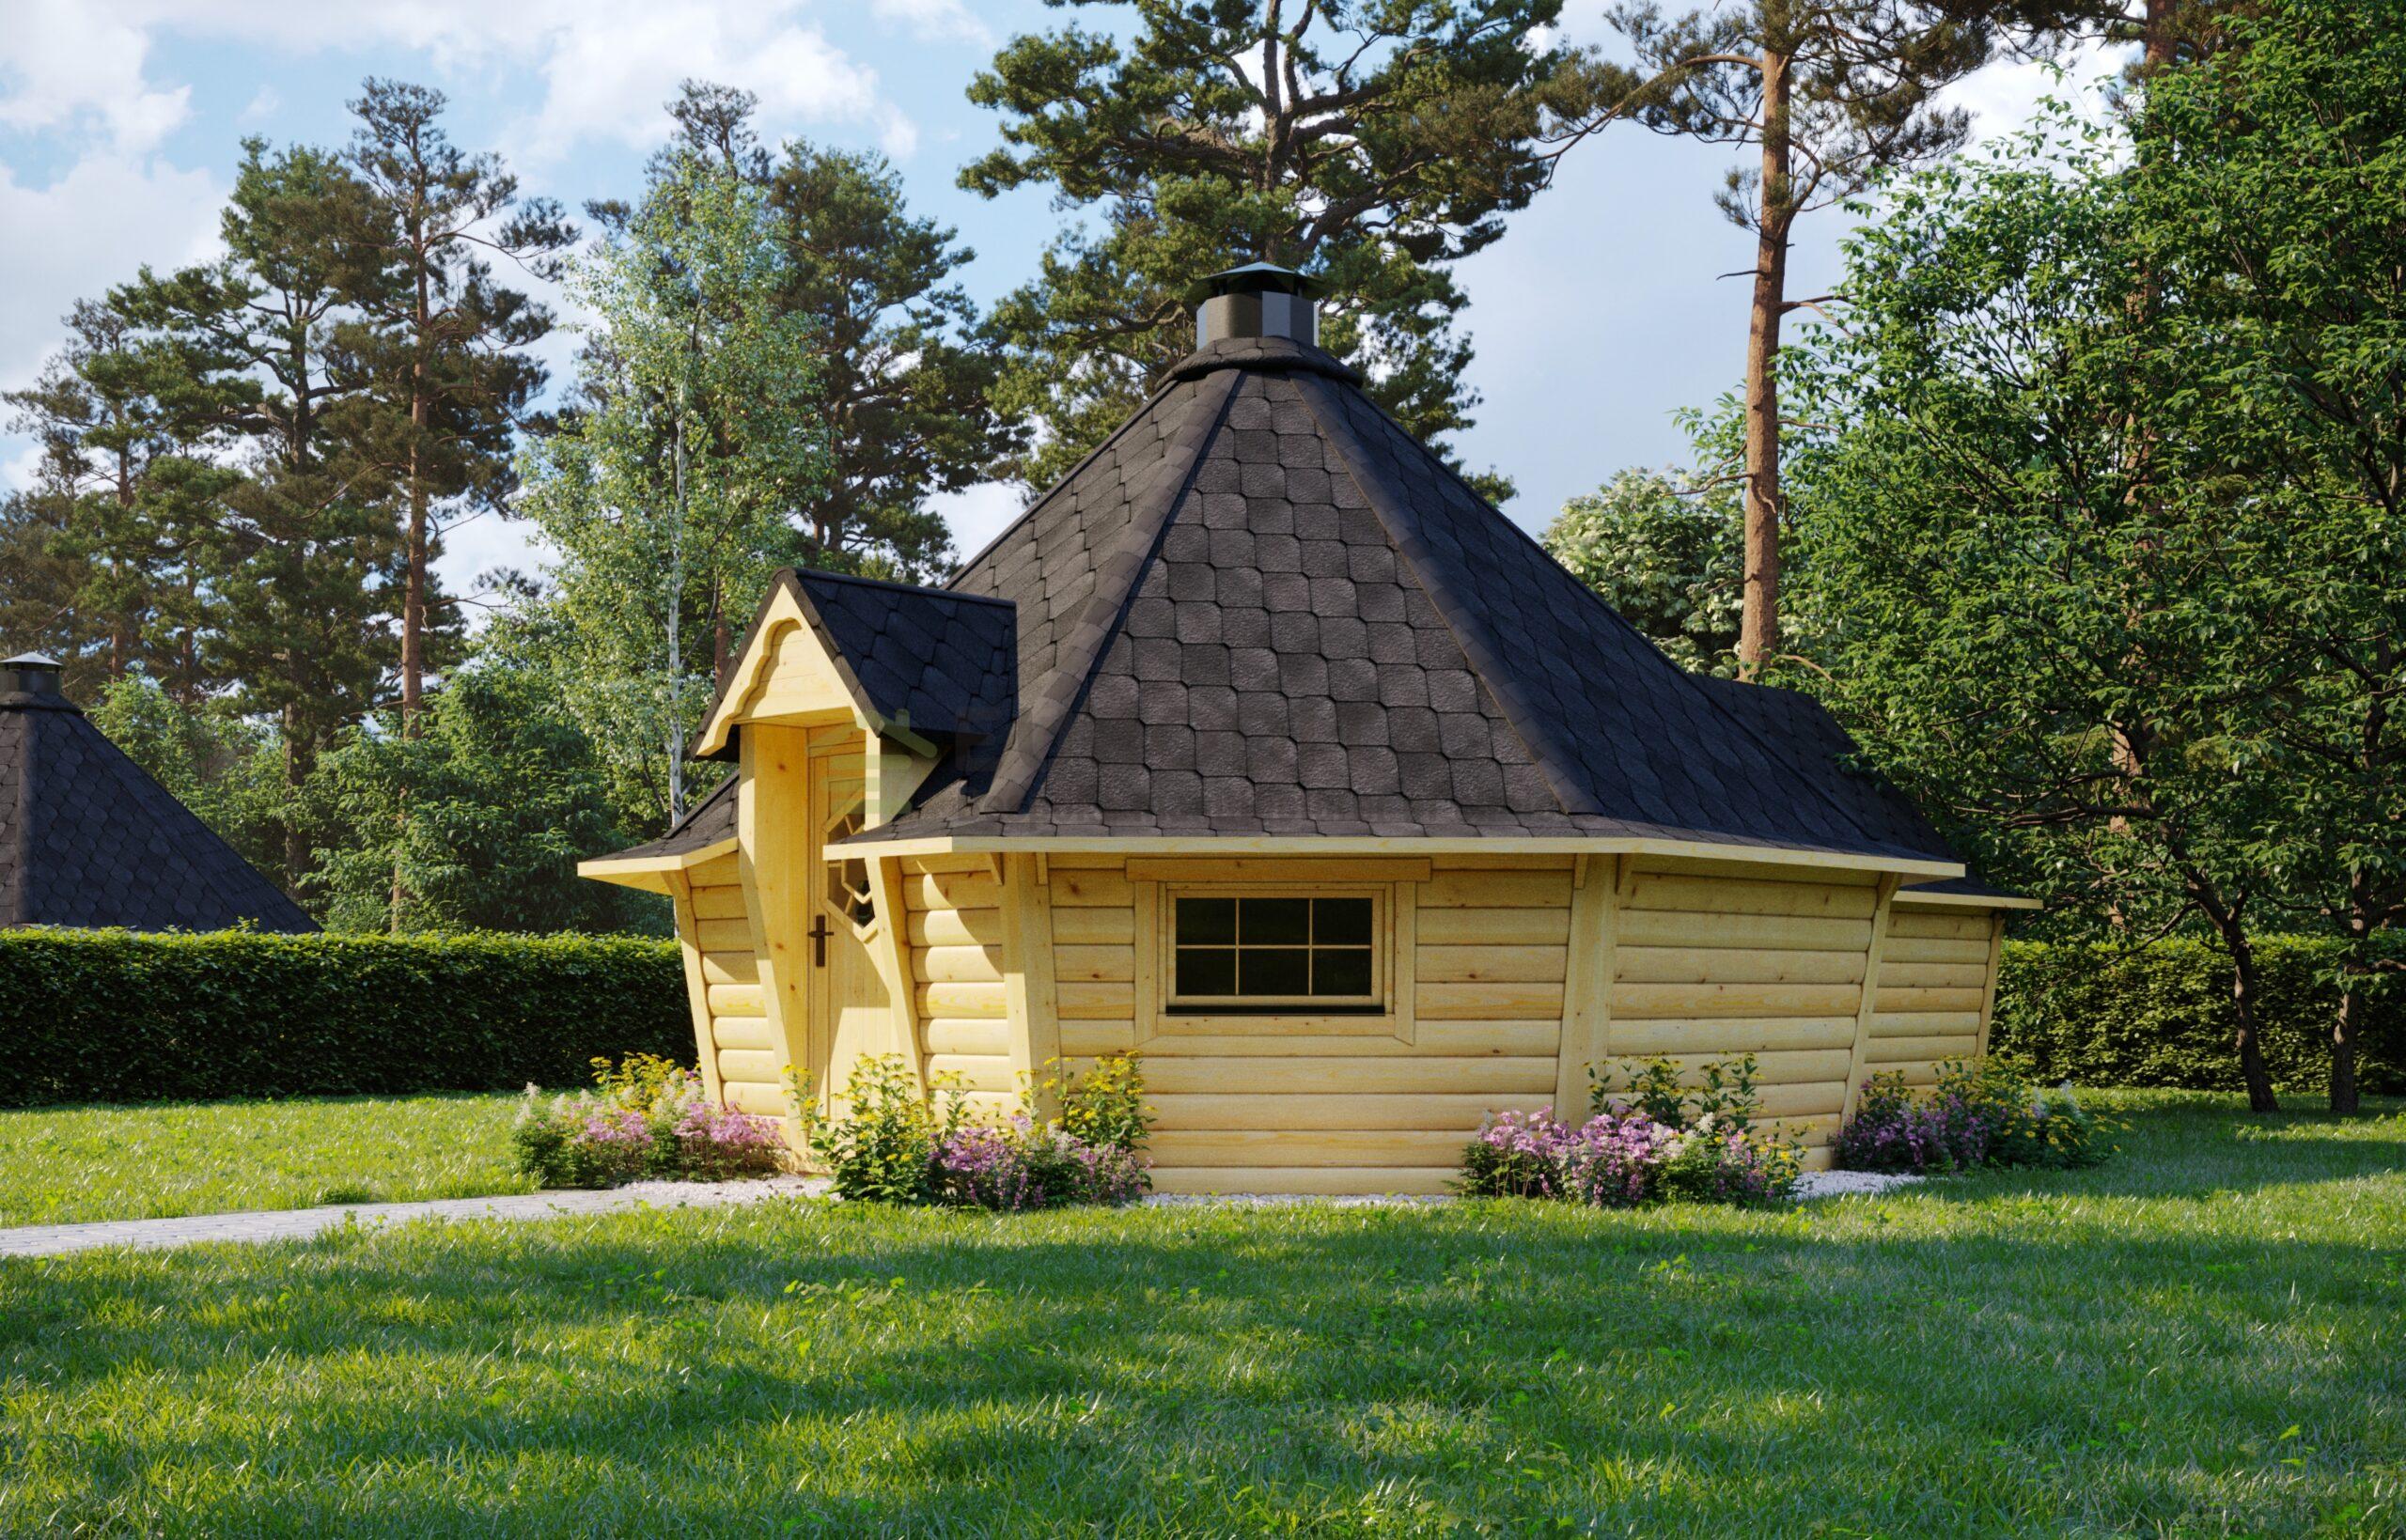 Modern BBQ Hut 16.5 m2 with 2.5 m Extension